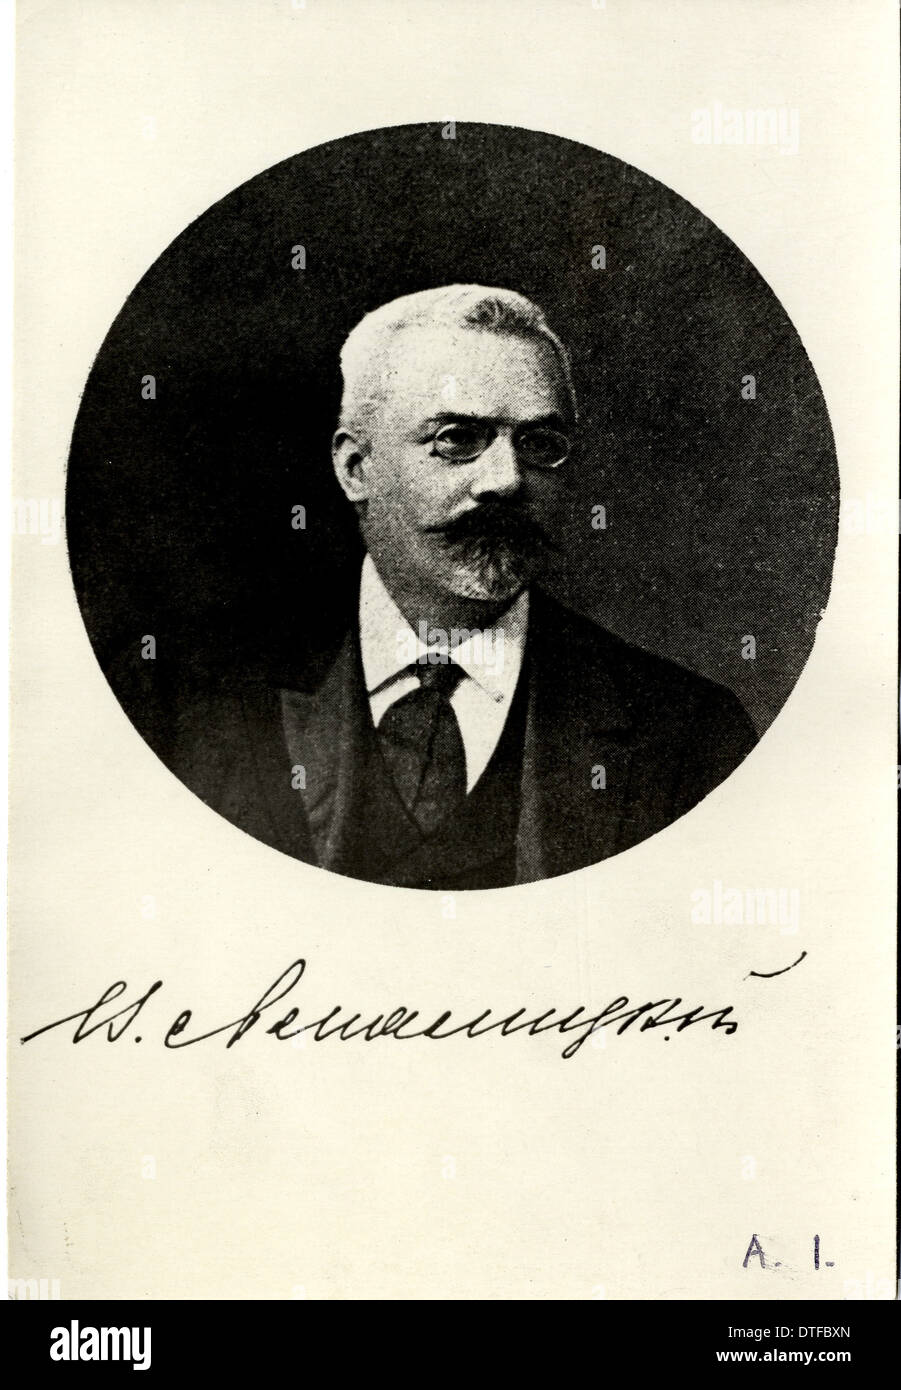 Vladimir Prokhorovich Amalitzkii (1860-1917) Foto Stock